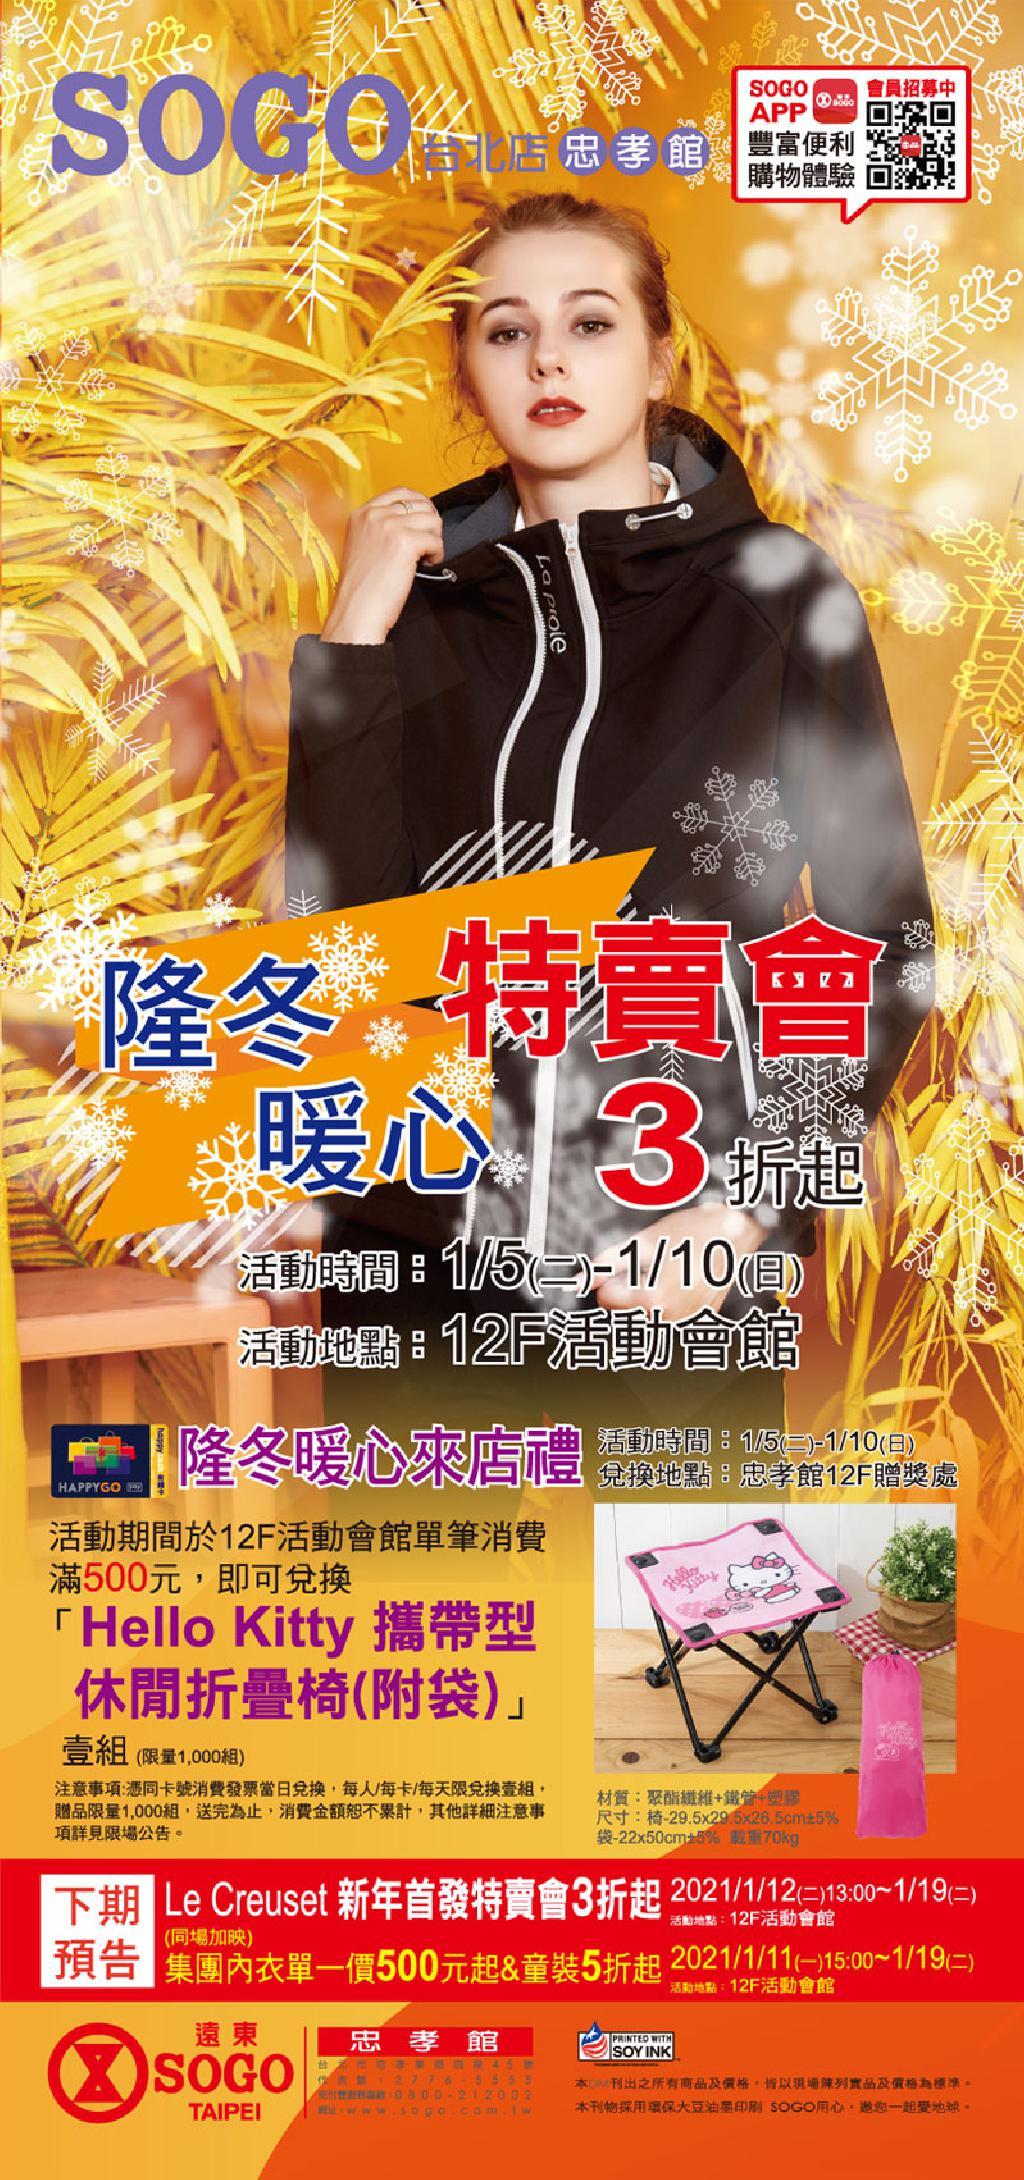 SOGO《台北忠孝館》DM 「「12F活動會館「隆冬暖心特賣會3折起」」【2021/1/10 止】